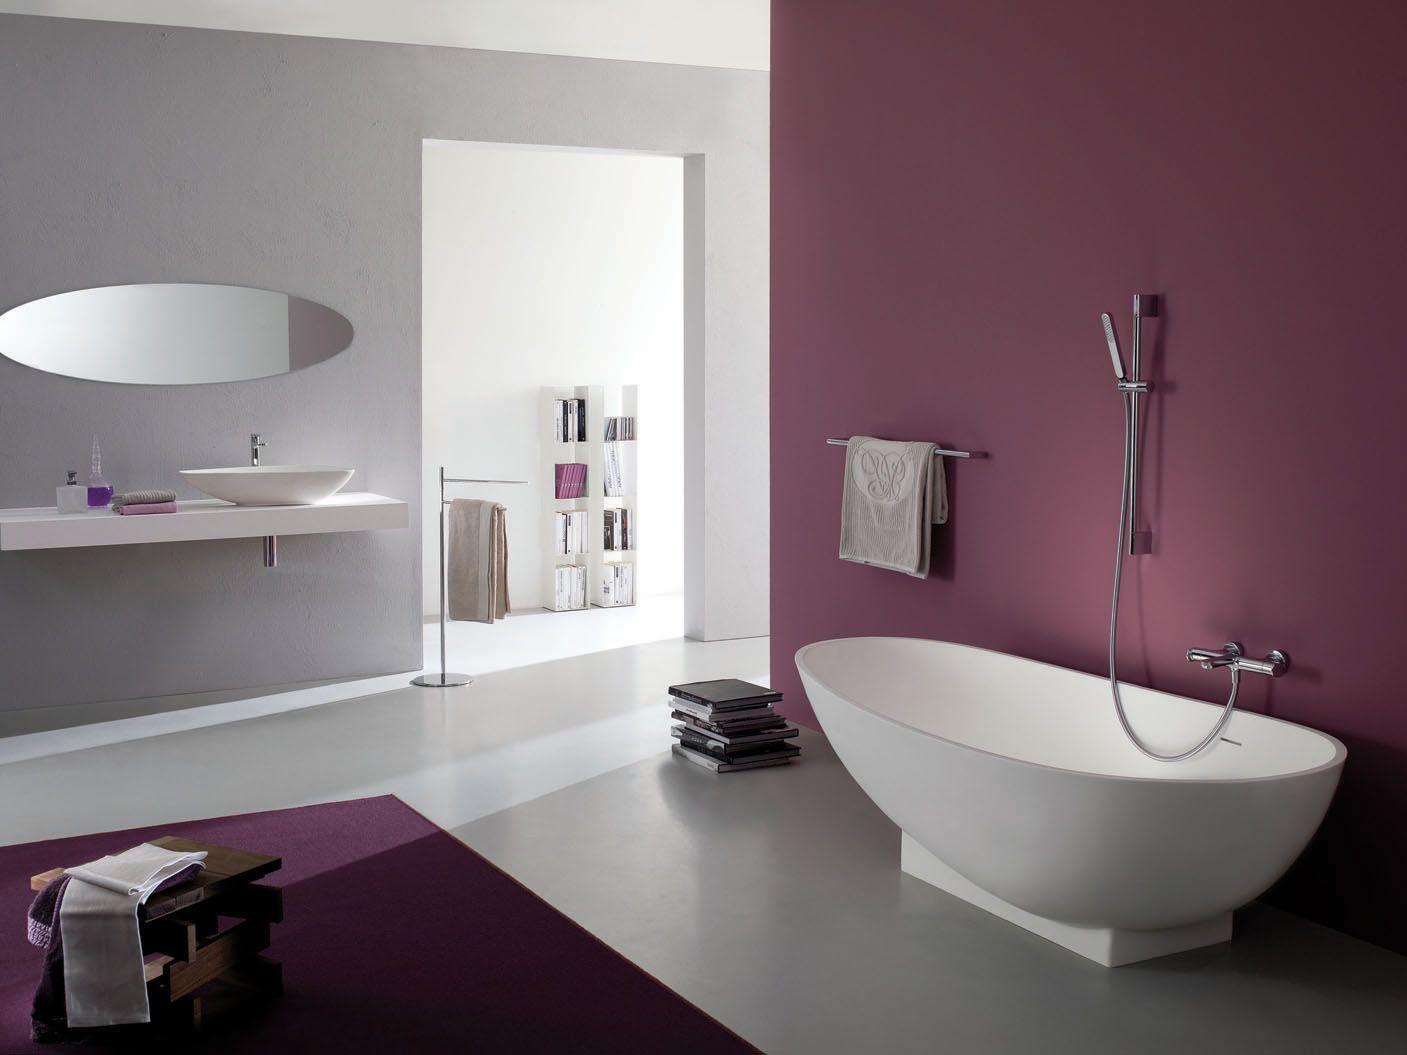 Lineaviva la linea bagno dallo stile elegante e raffinato